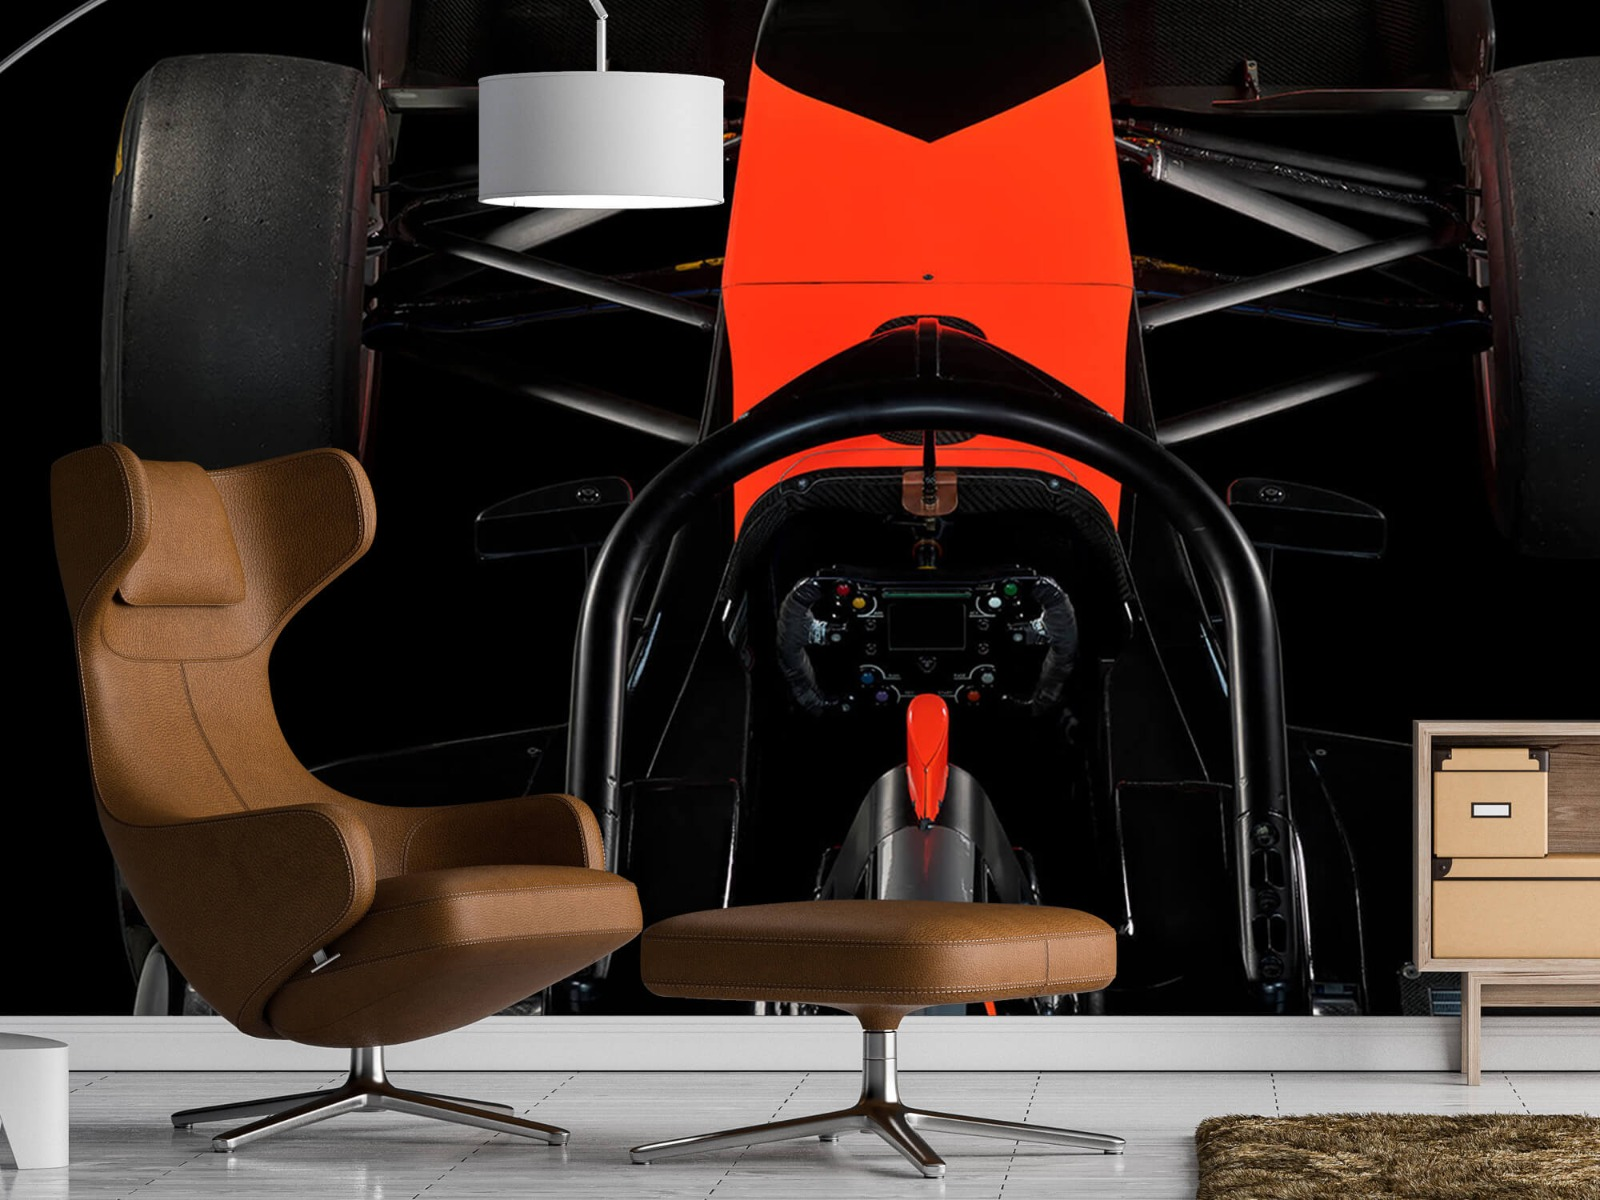 Sportauto's - Formule 3 - Cockpit view - dark - Tienerkamer 19